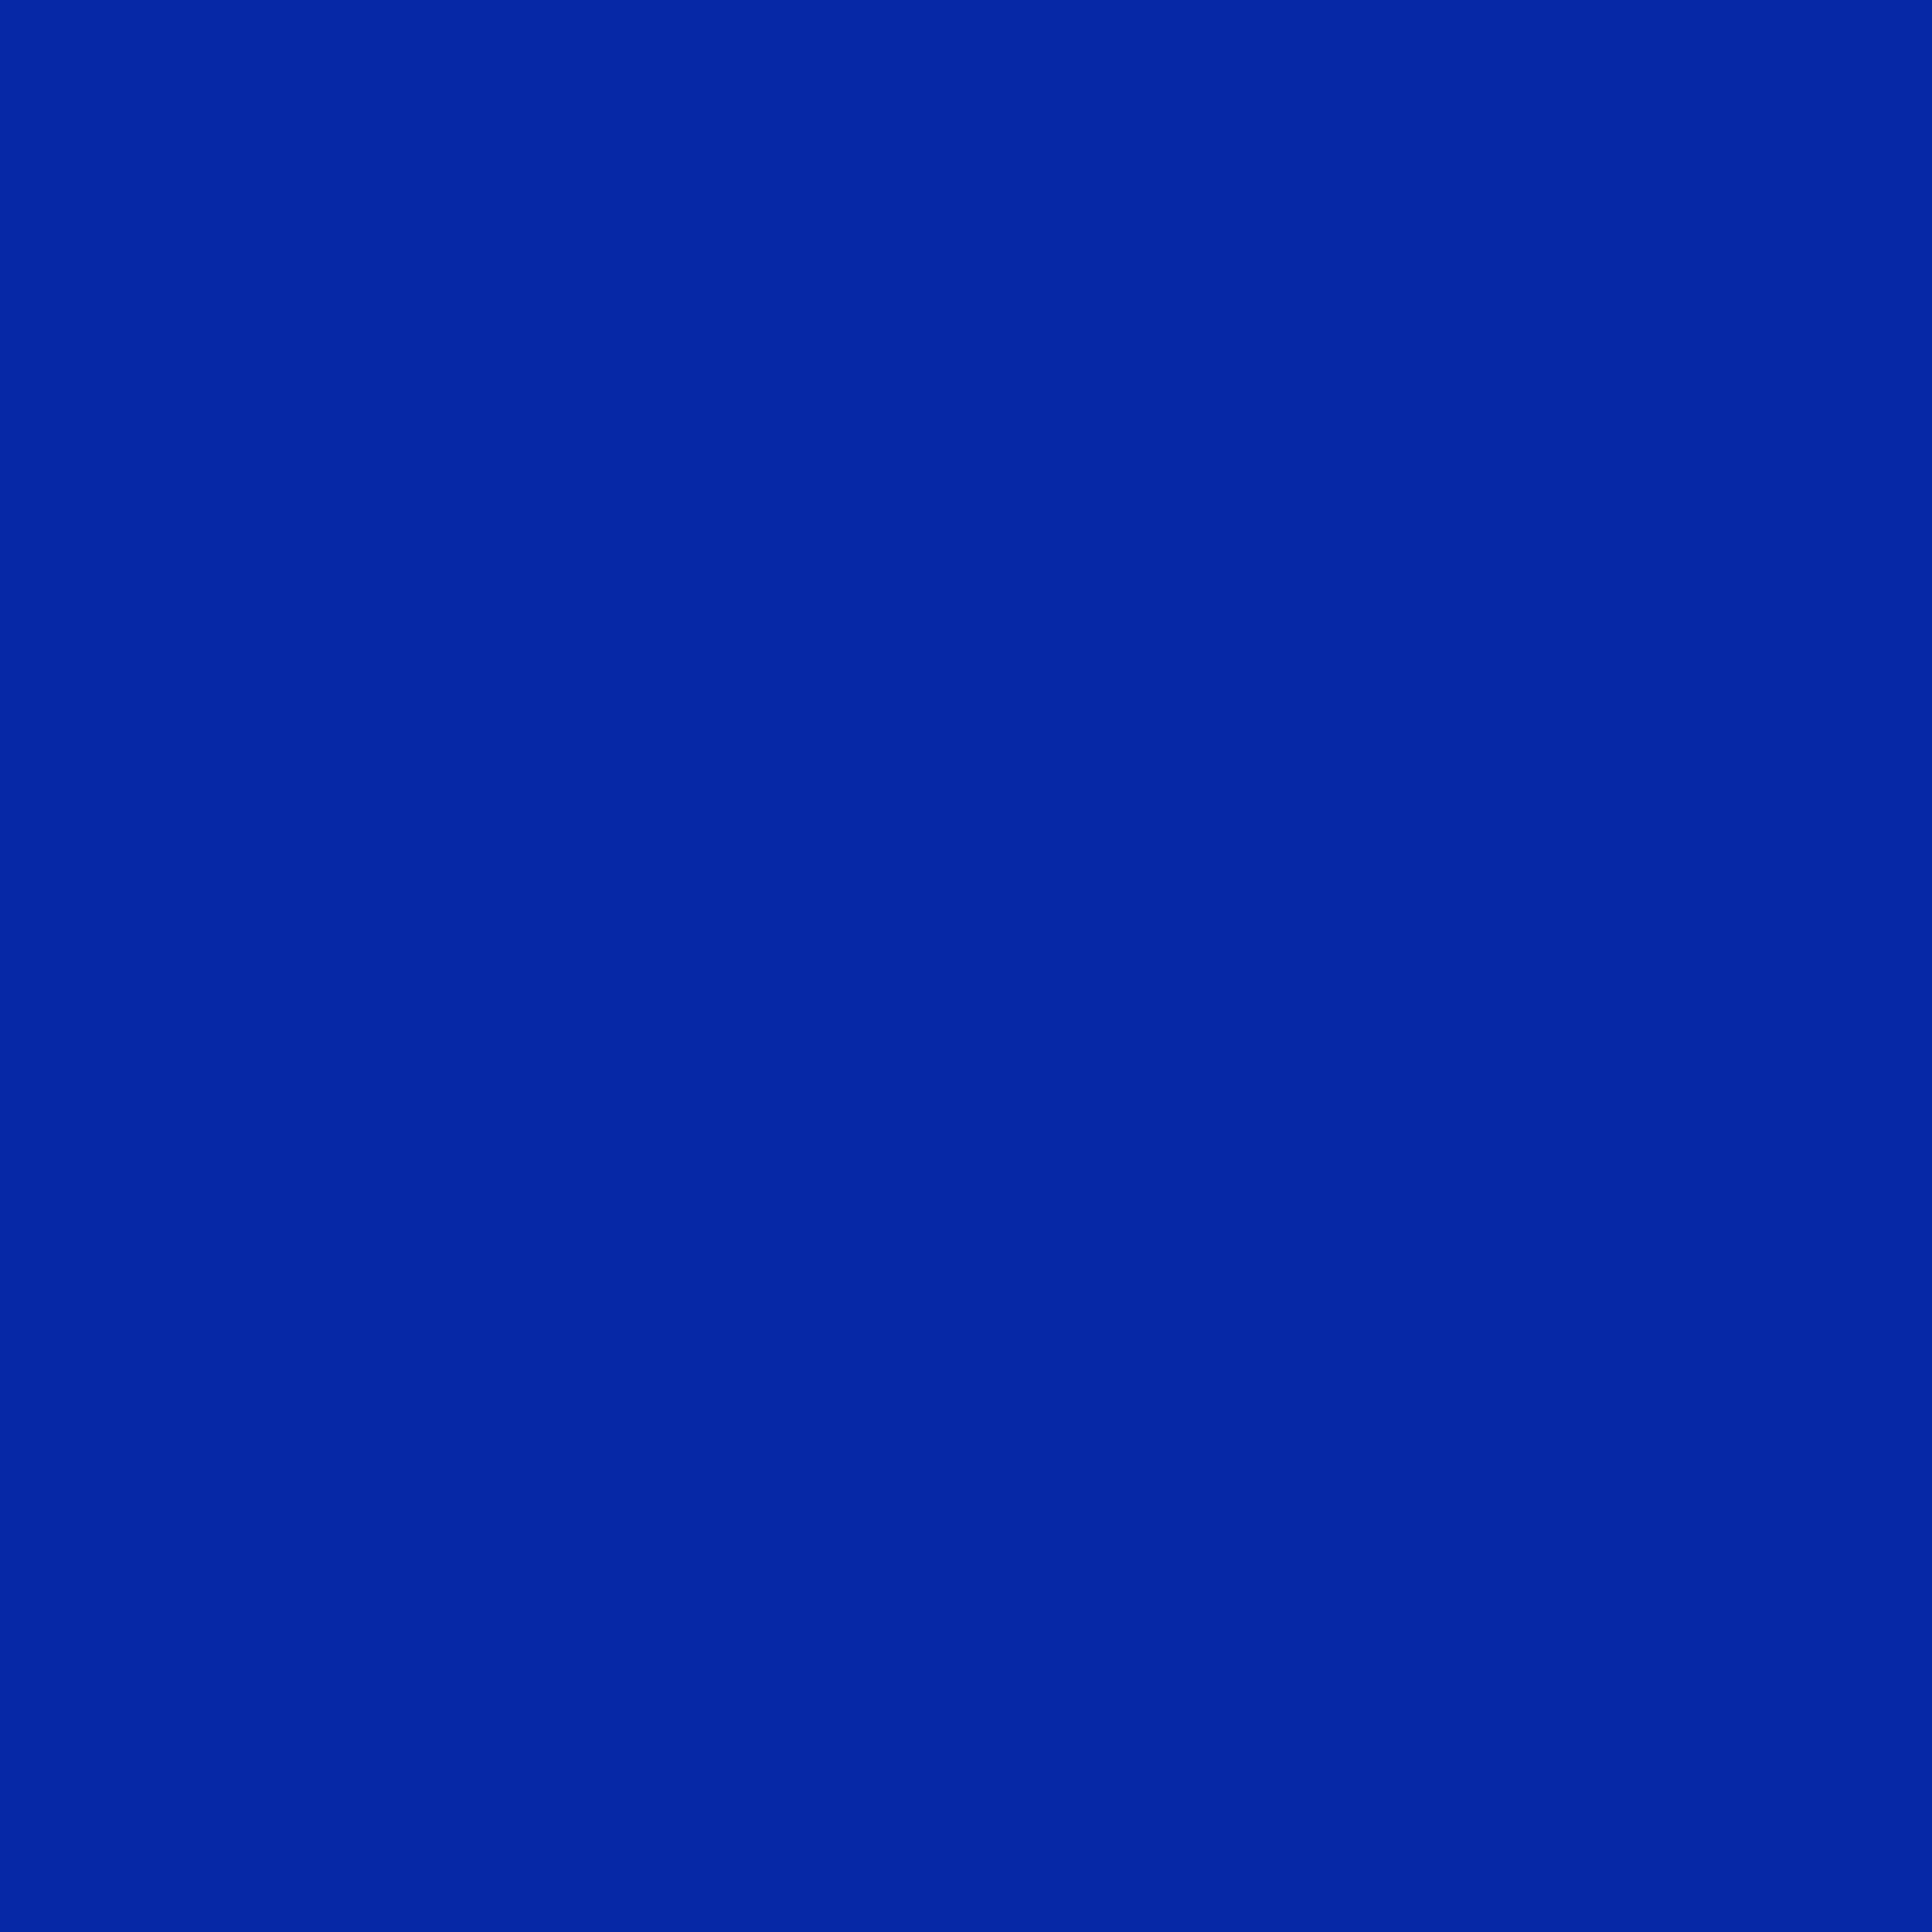 K21.5.4 Cobalt Blue